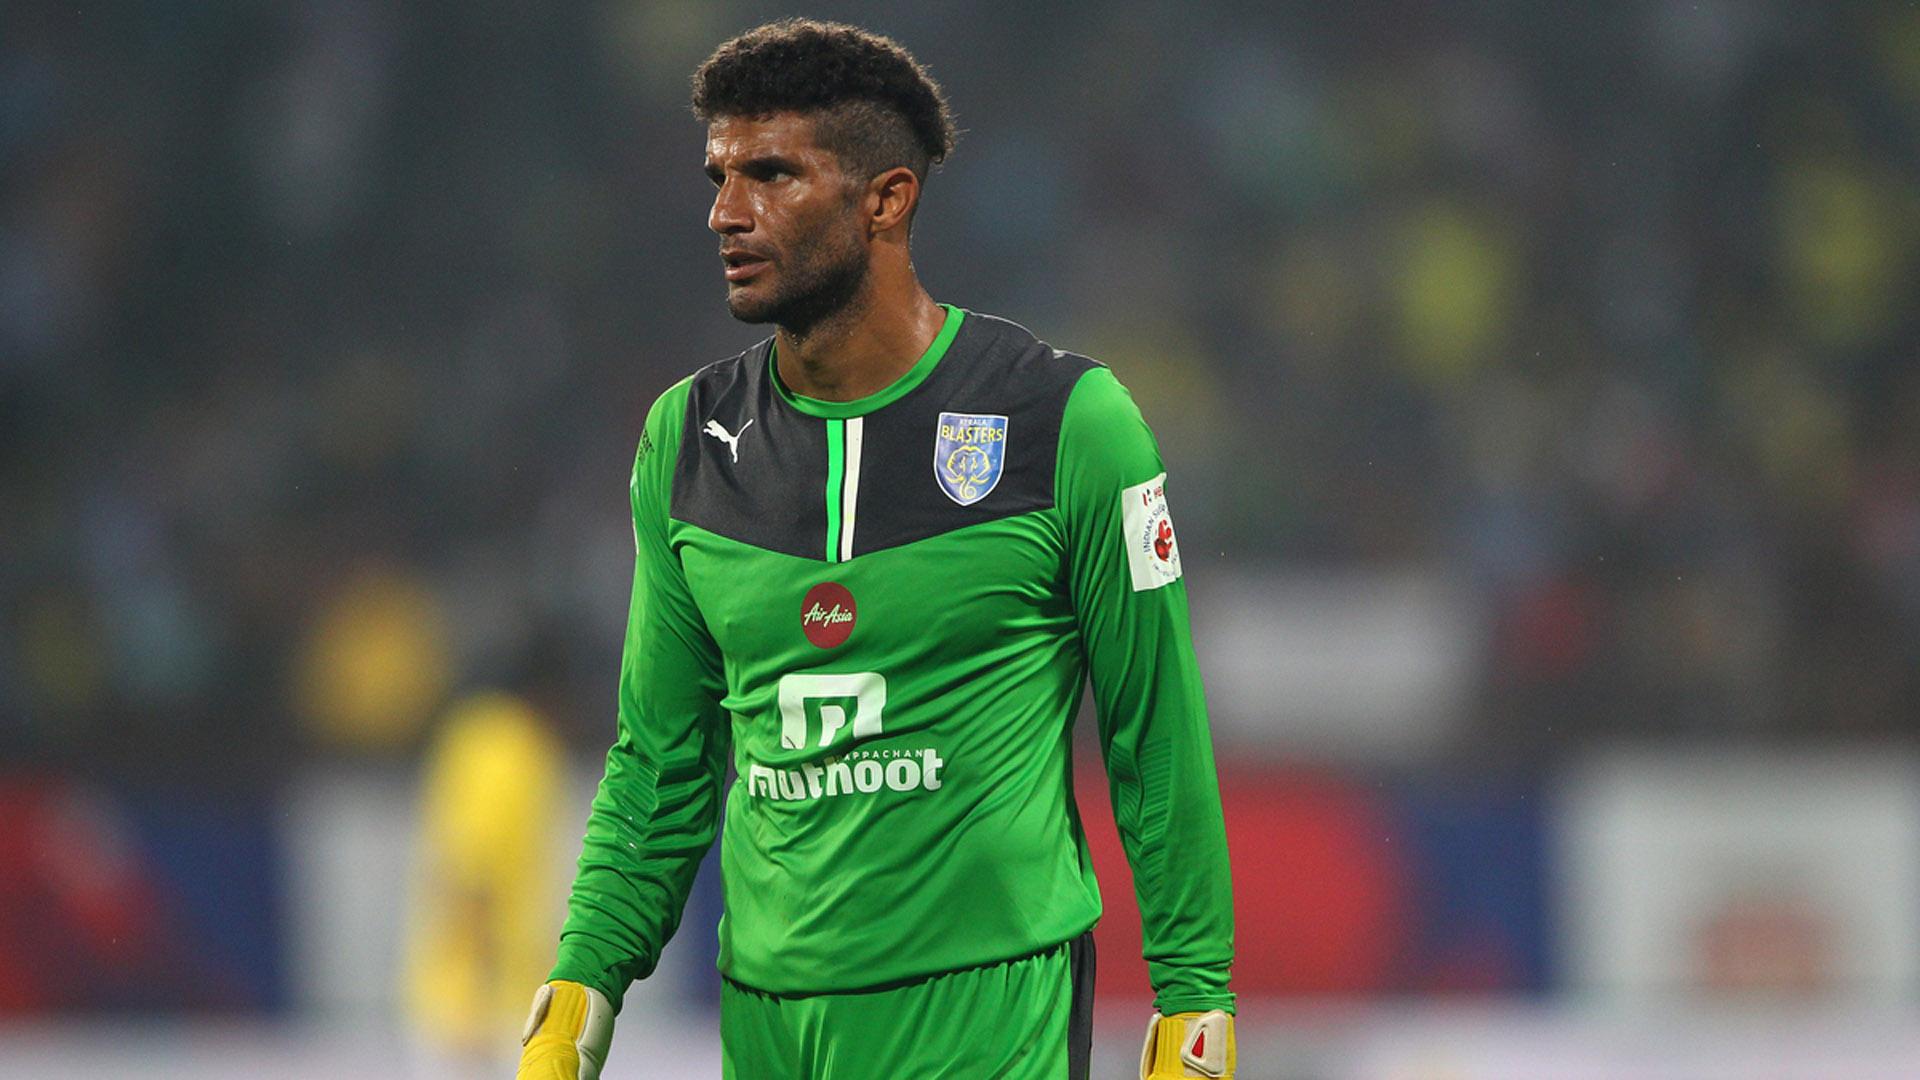 Kerala Blasters FC goalkeeper David James during ISL match